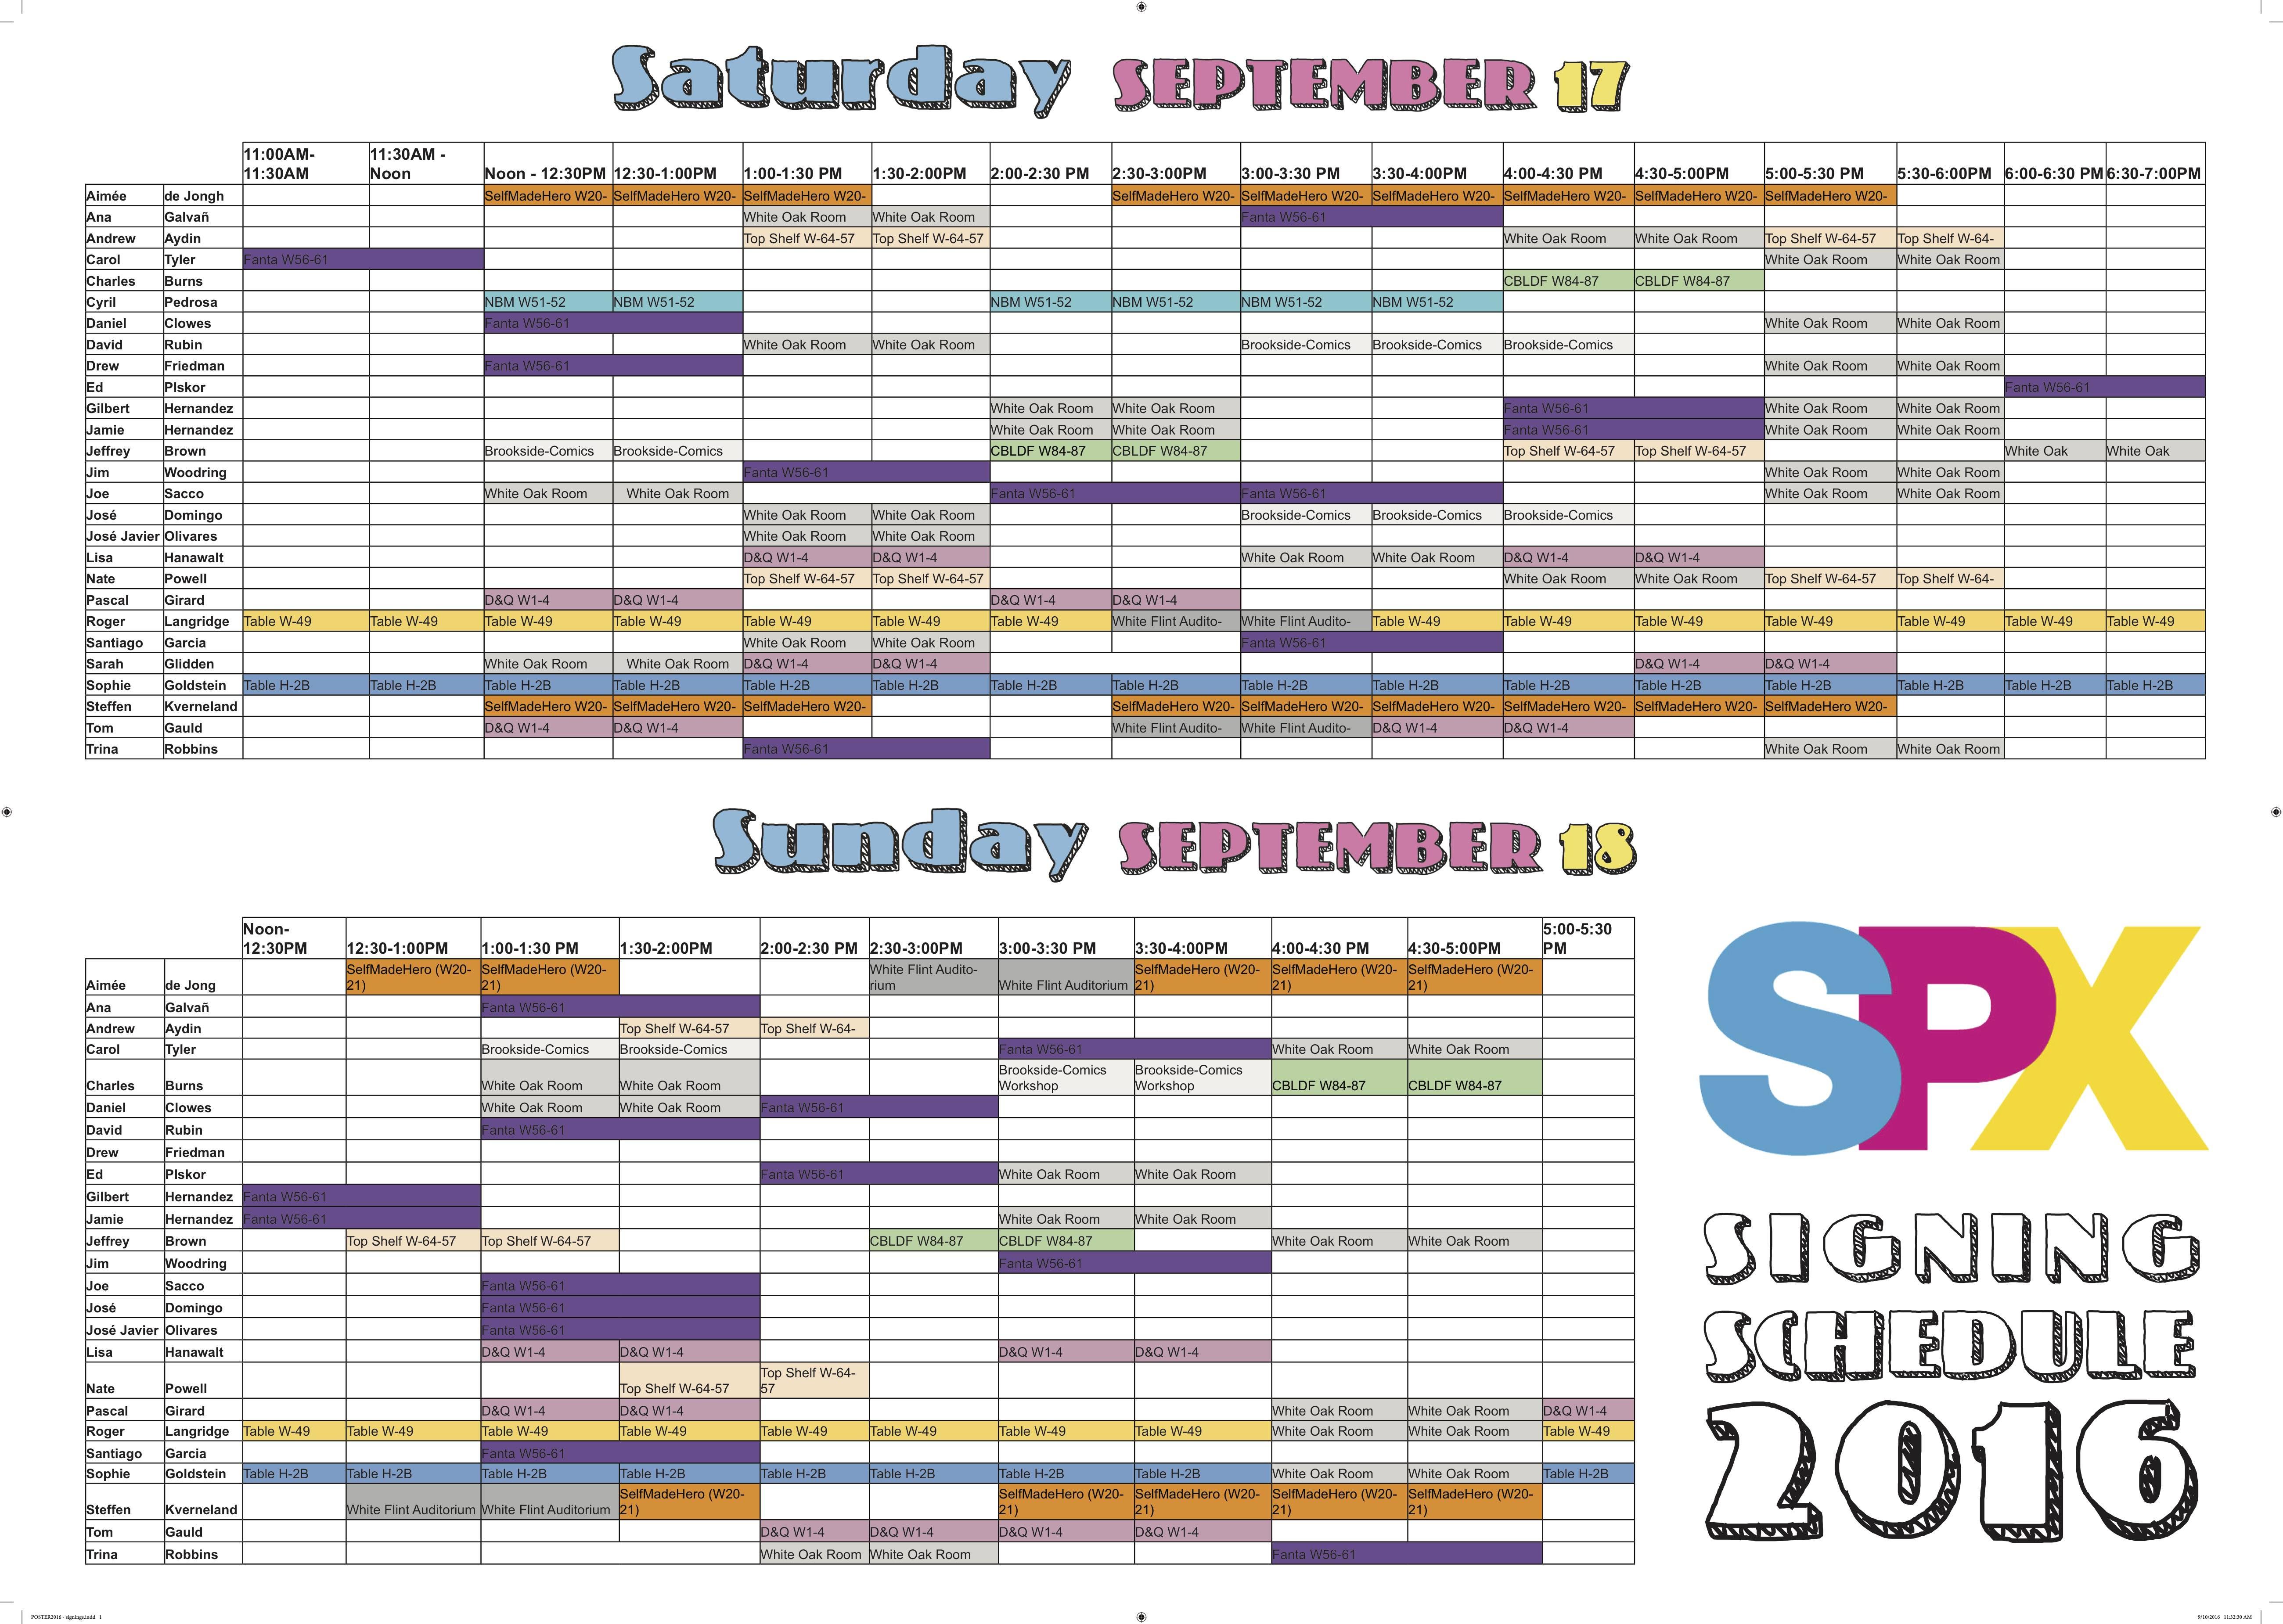 spx-banner-2016-signing-schedule